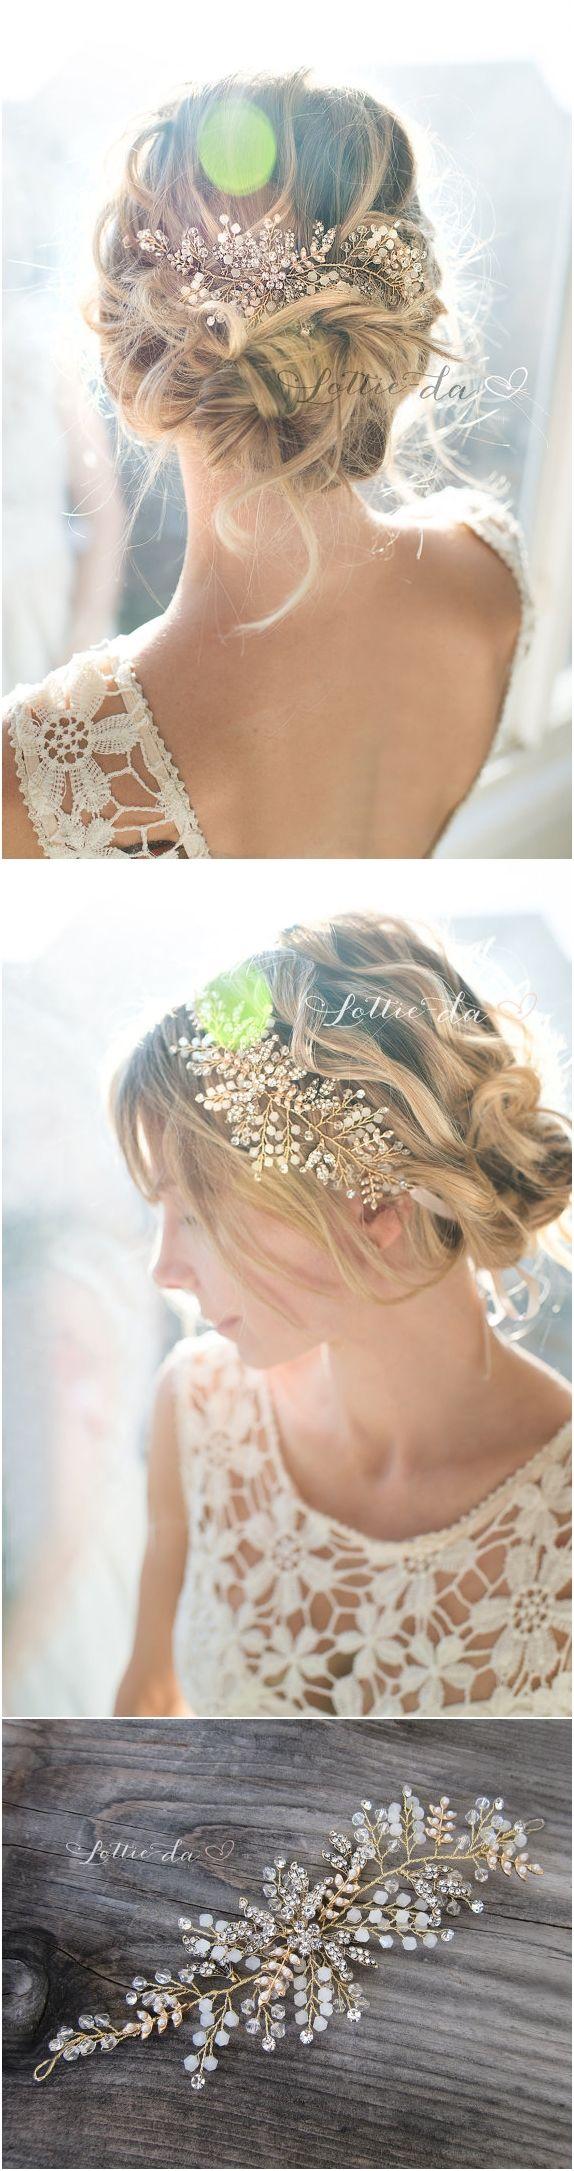 Gold, Antique Gold, Silver, Rose Gold Boho Headpiece, Opal Flower Hair Crown, Ha...